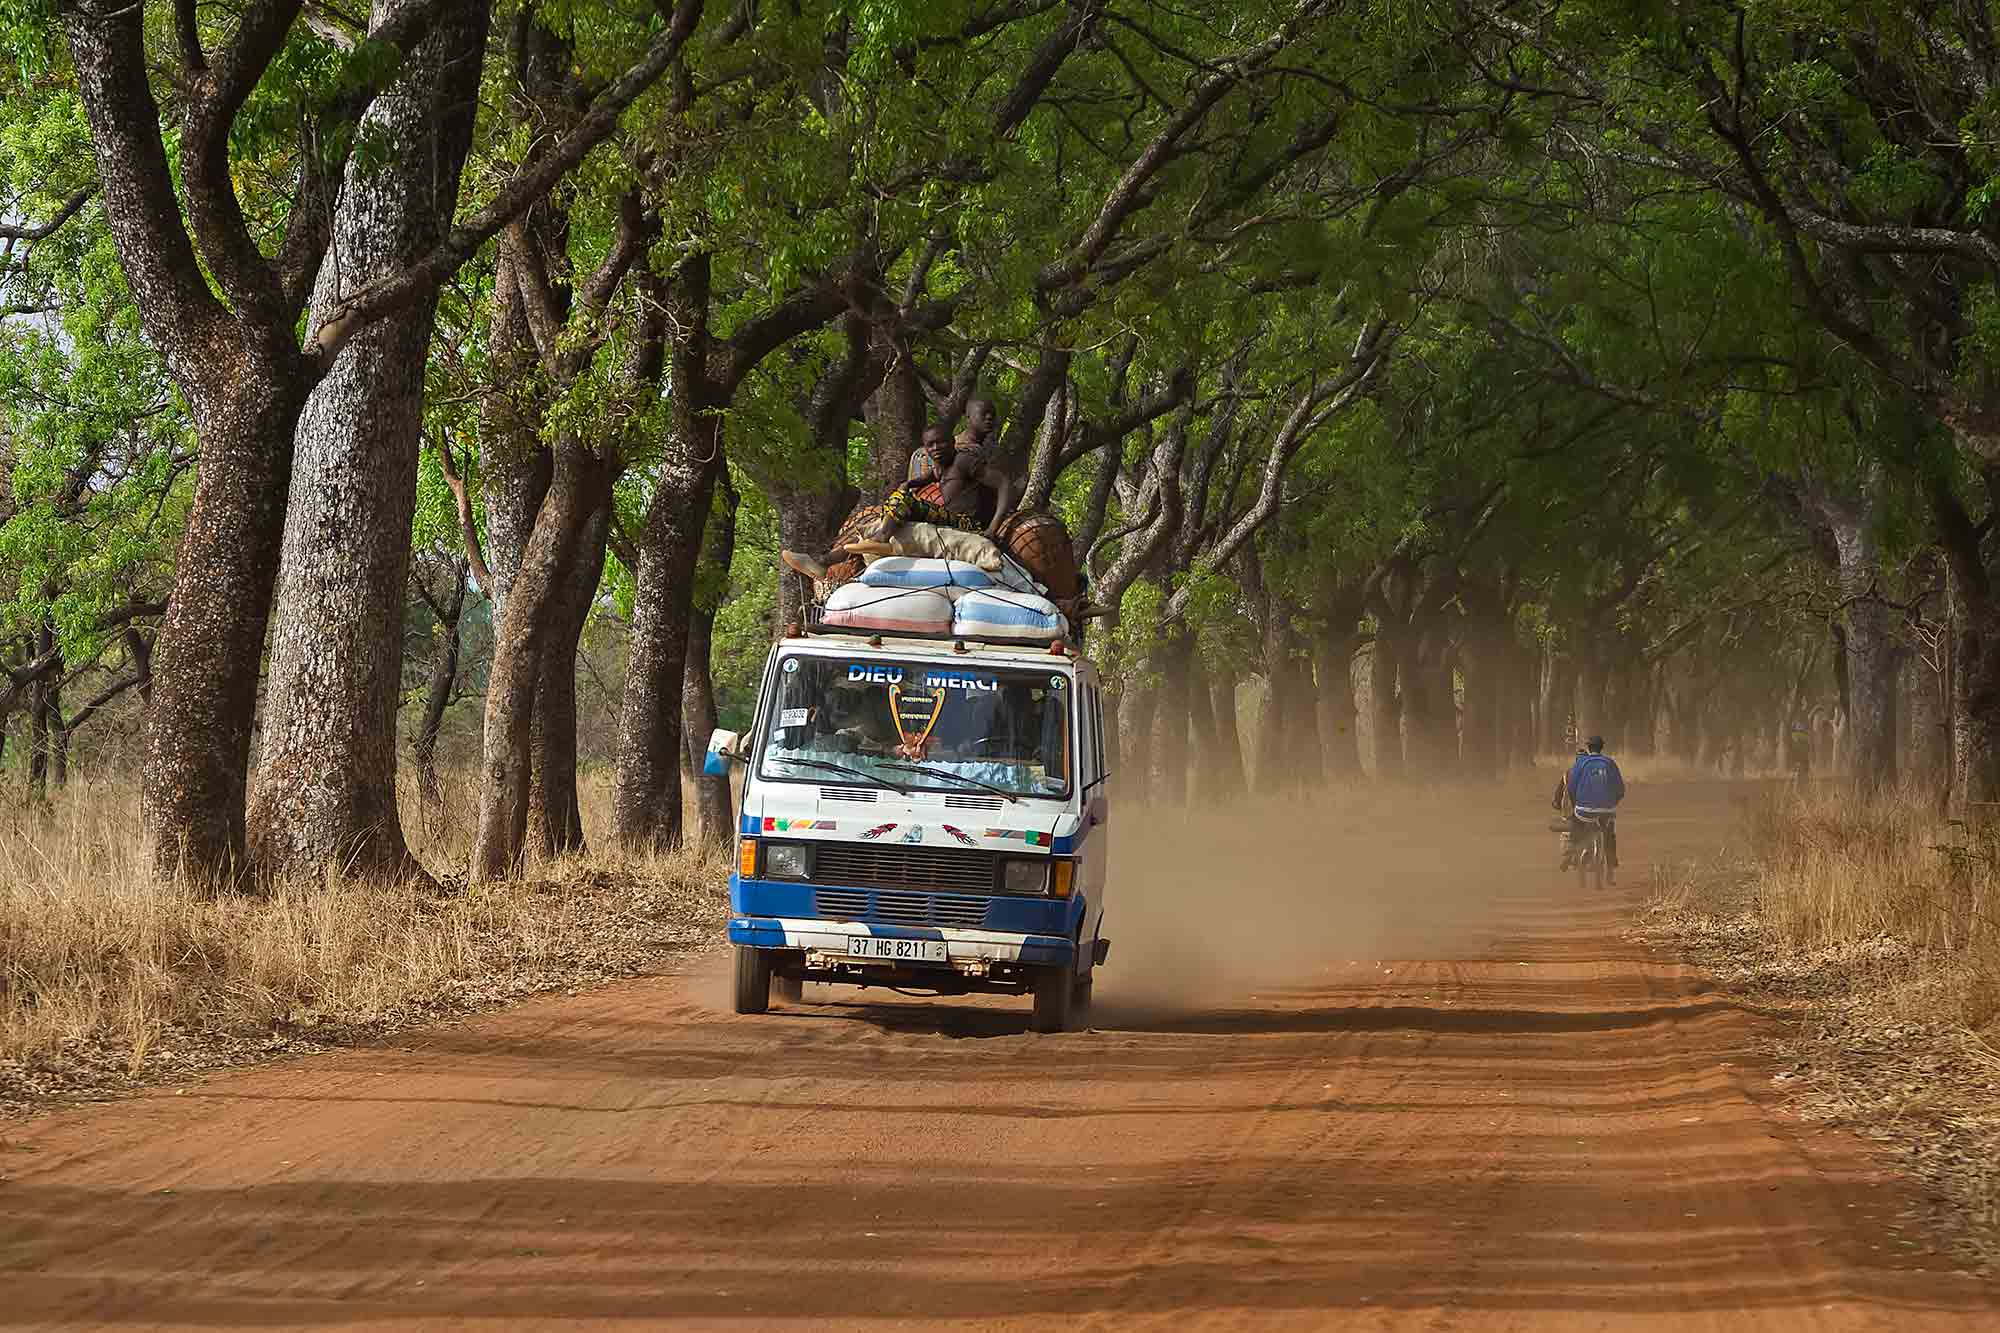 bush-taxi-driving-through-alley-of-trees-banfora-burkina-faso-africa